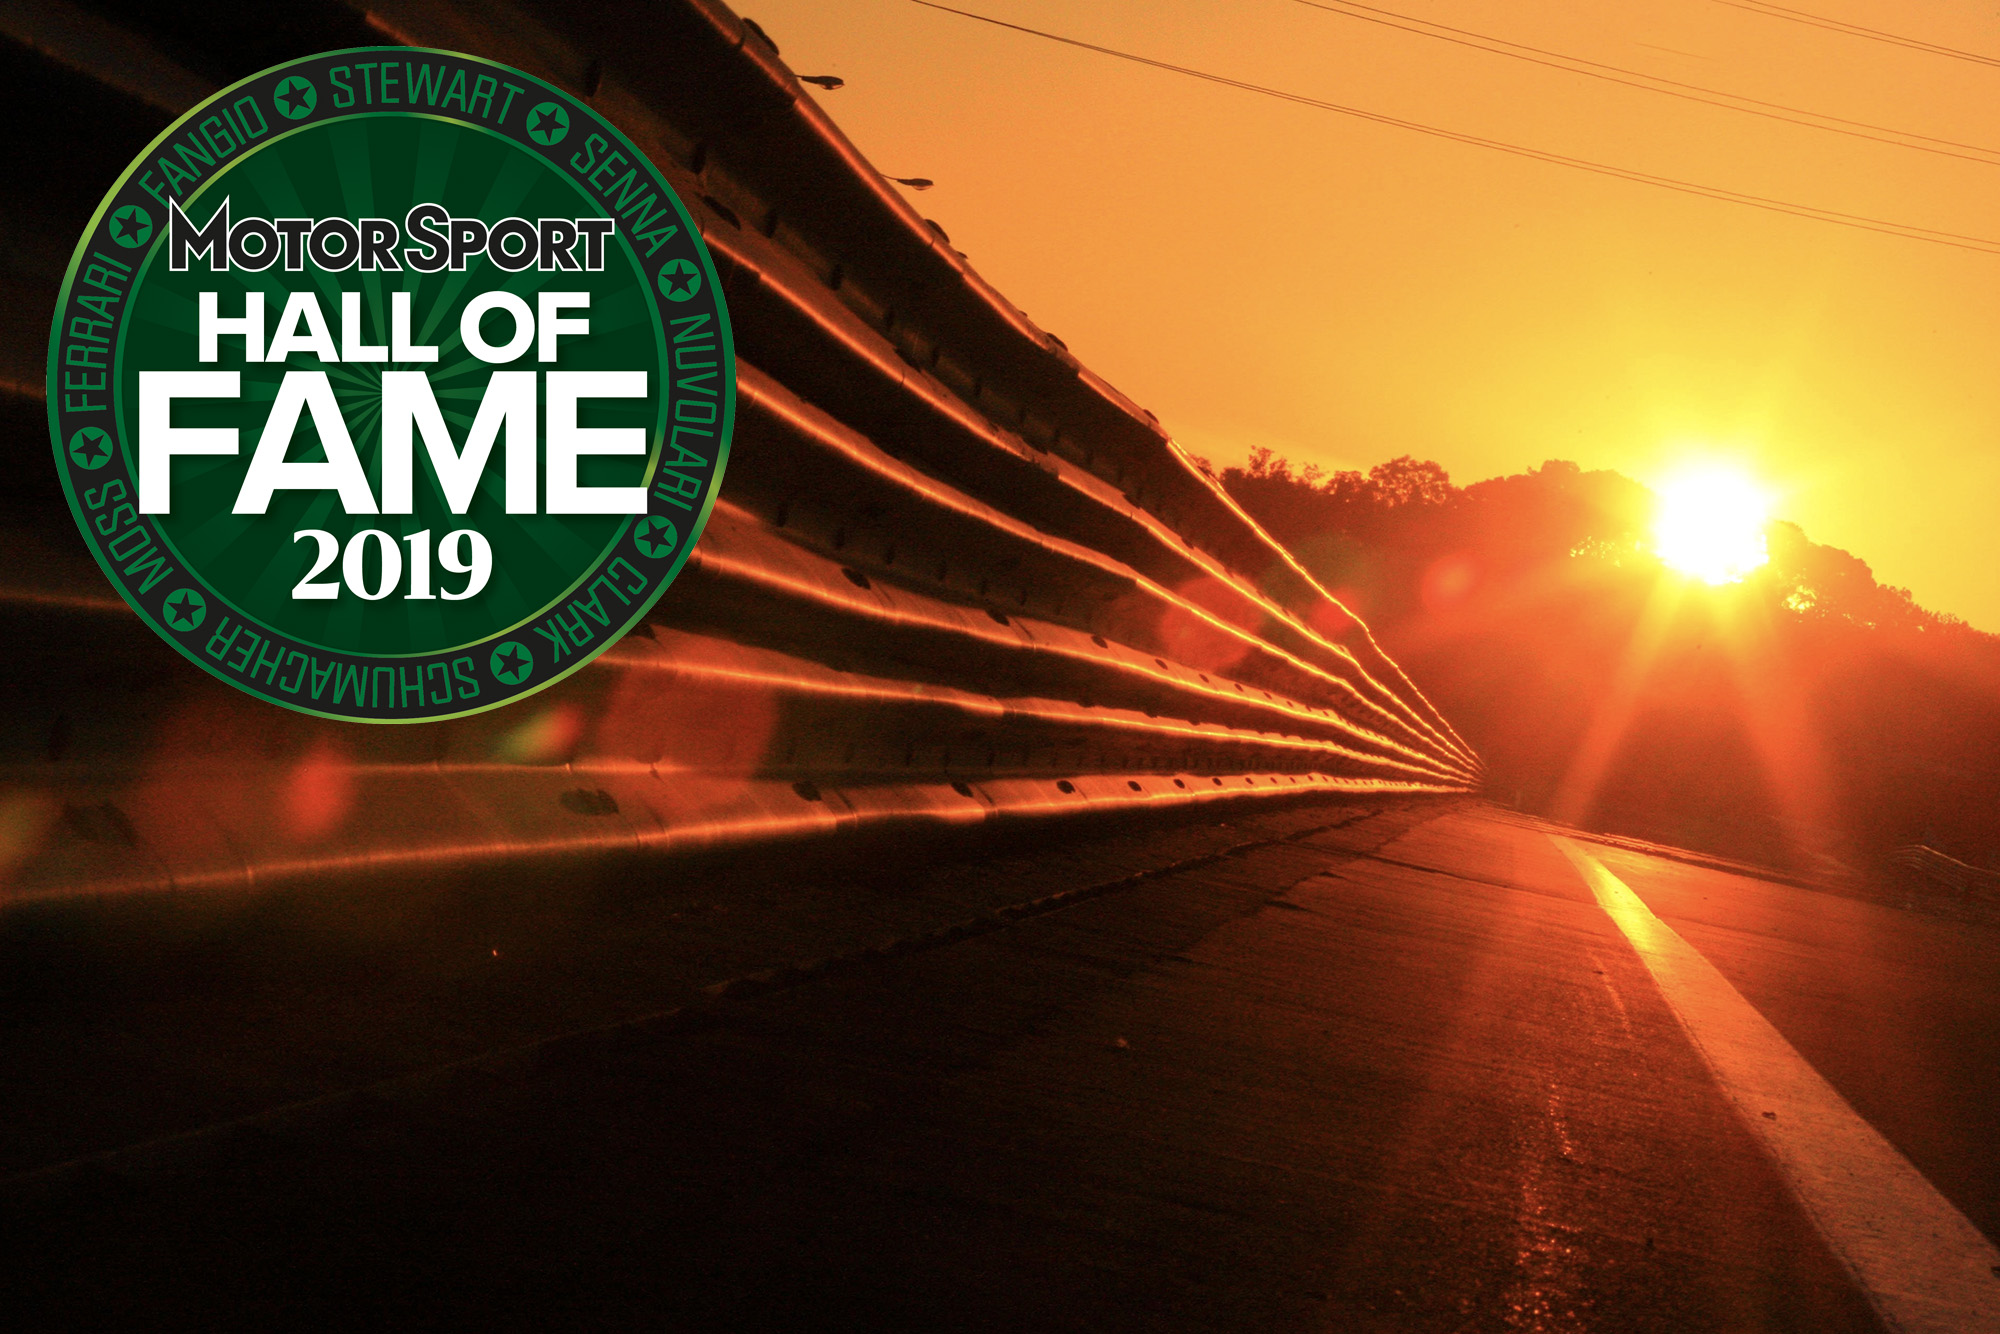 Inspiration Award – 2019 Motor Sport Hall of Fame nominees